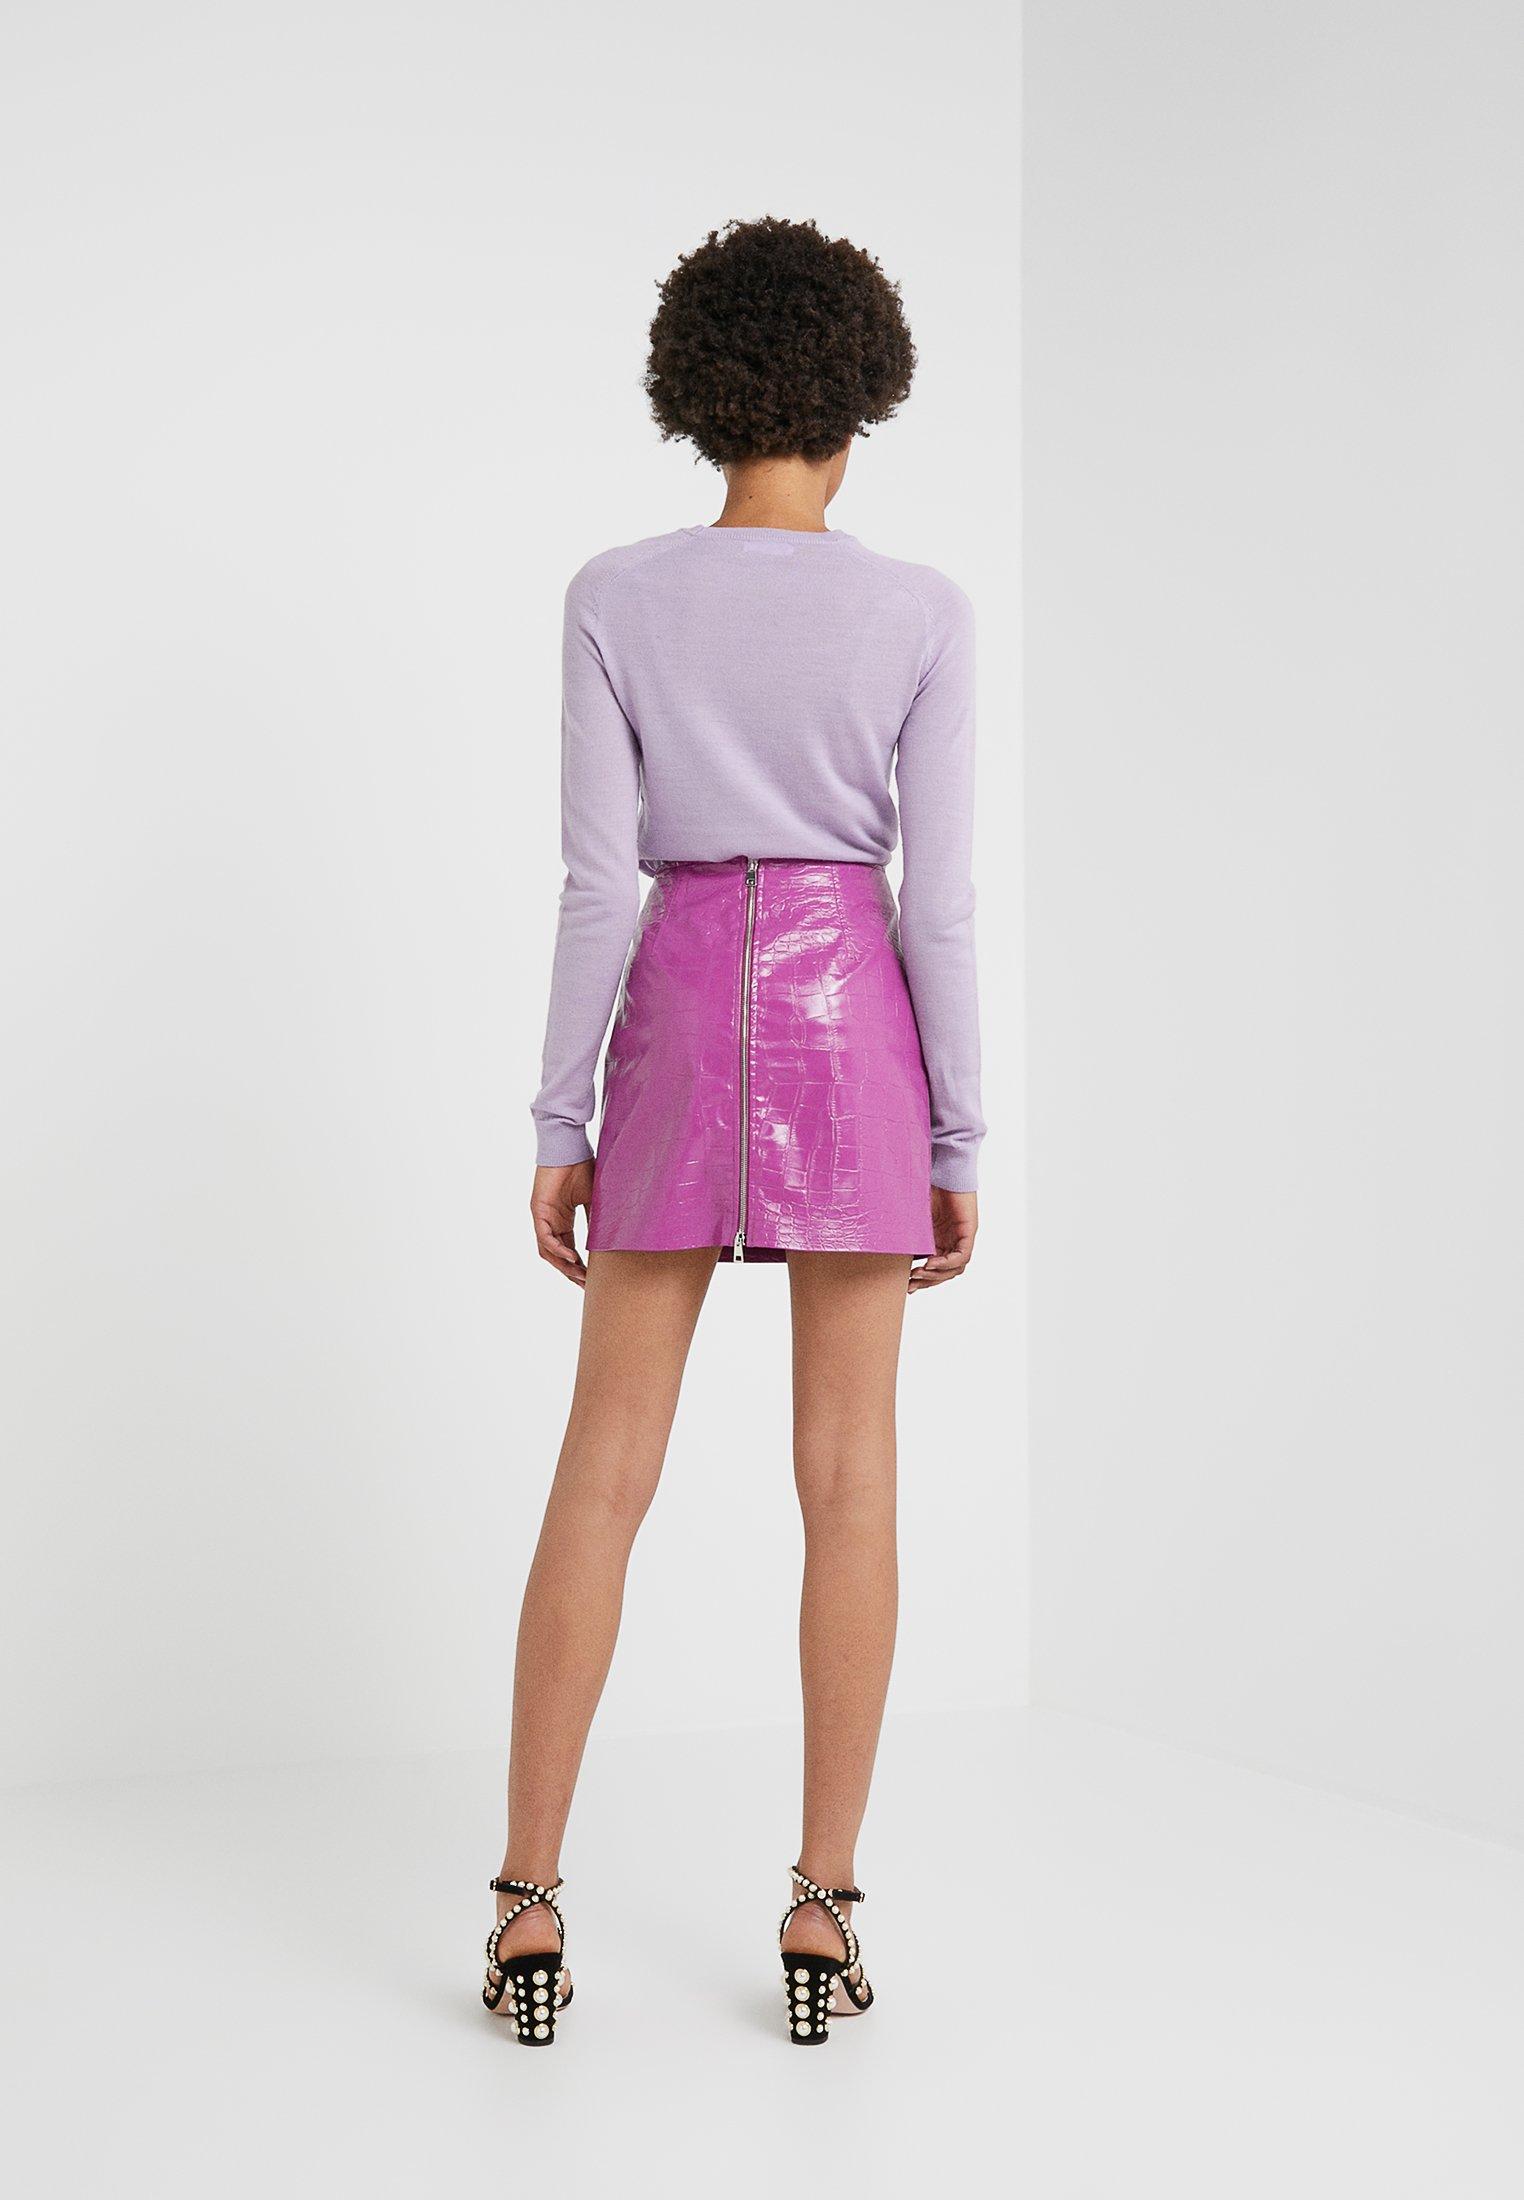 Pinko OPINION GONNA COCCO LUCIDATO - Minigonna purple